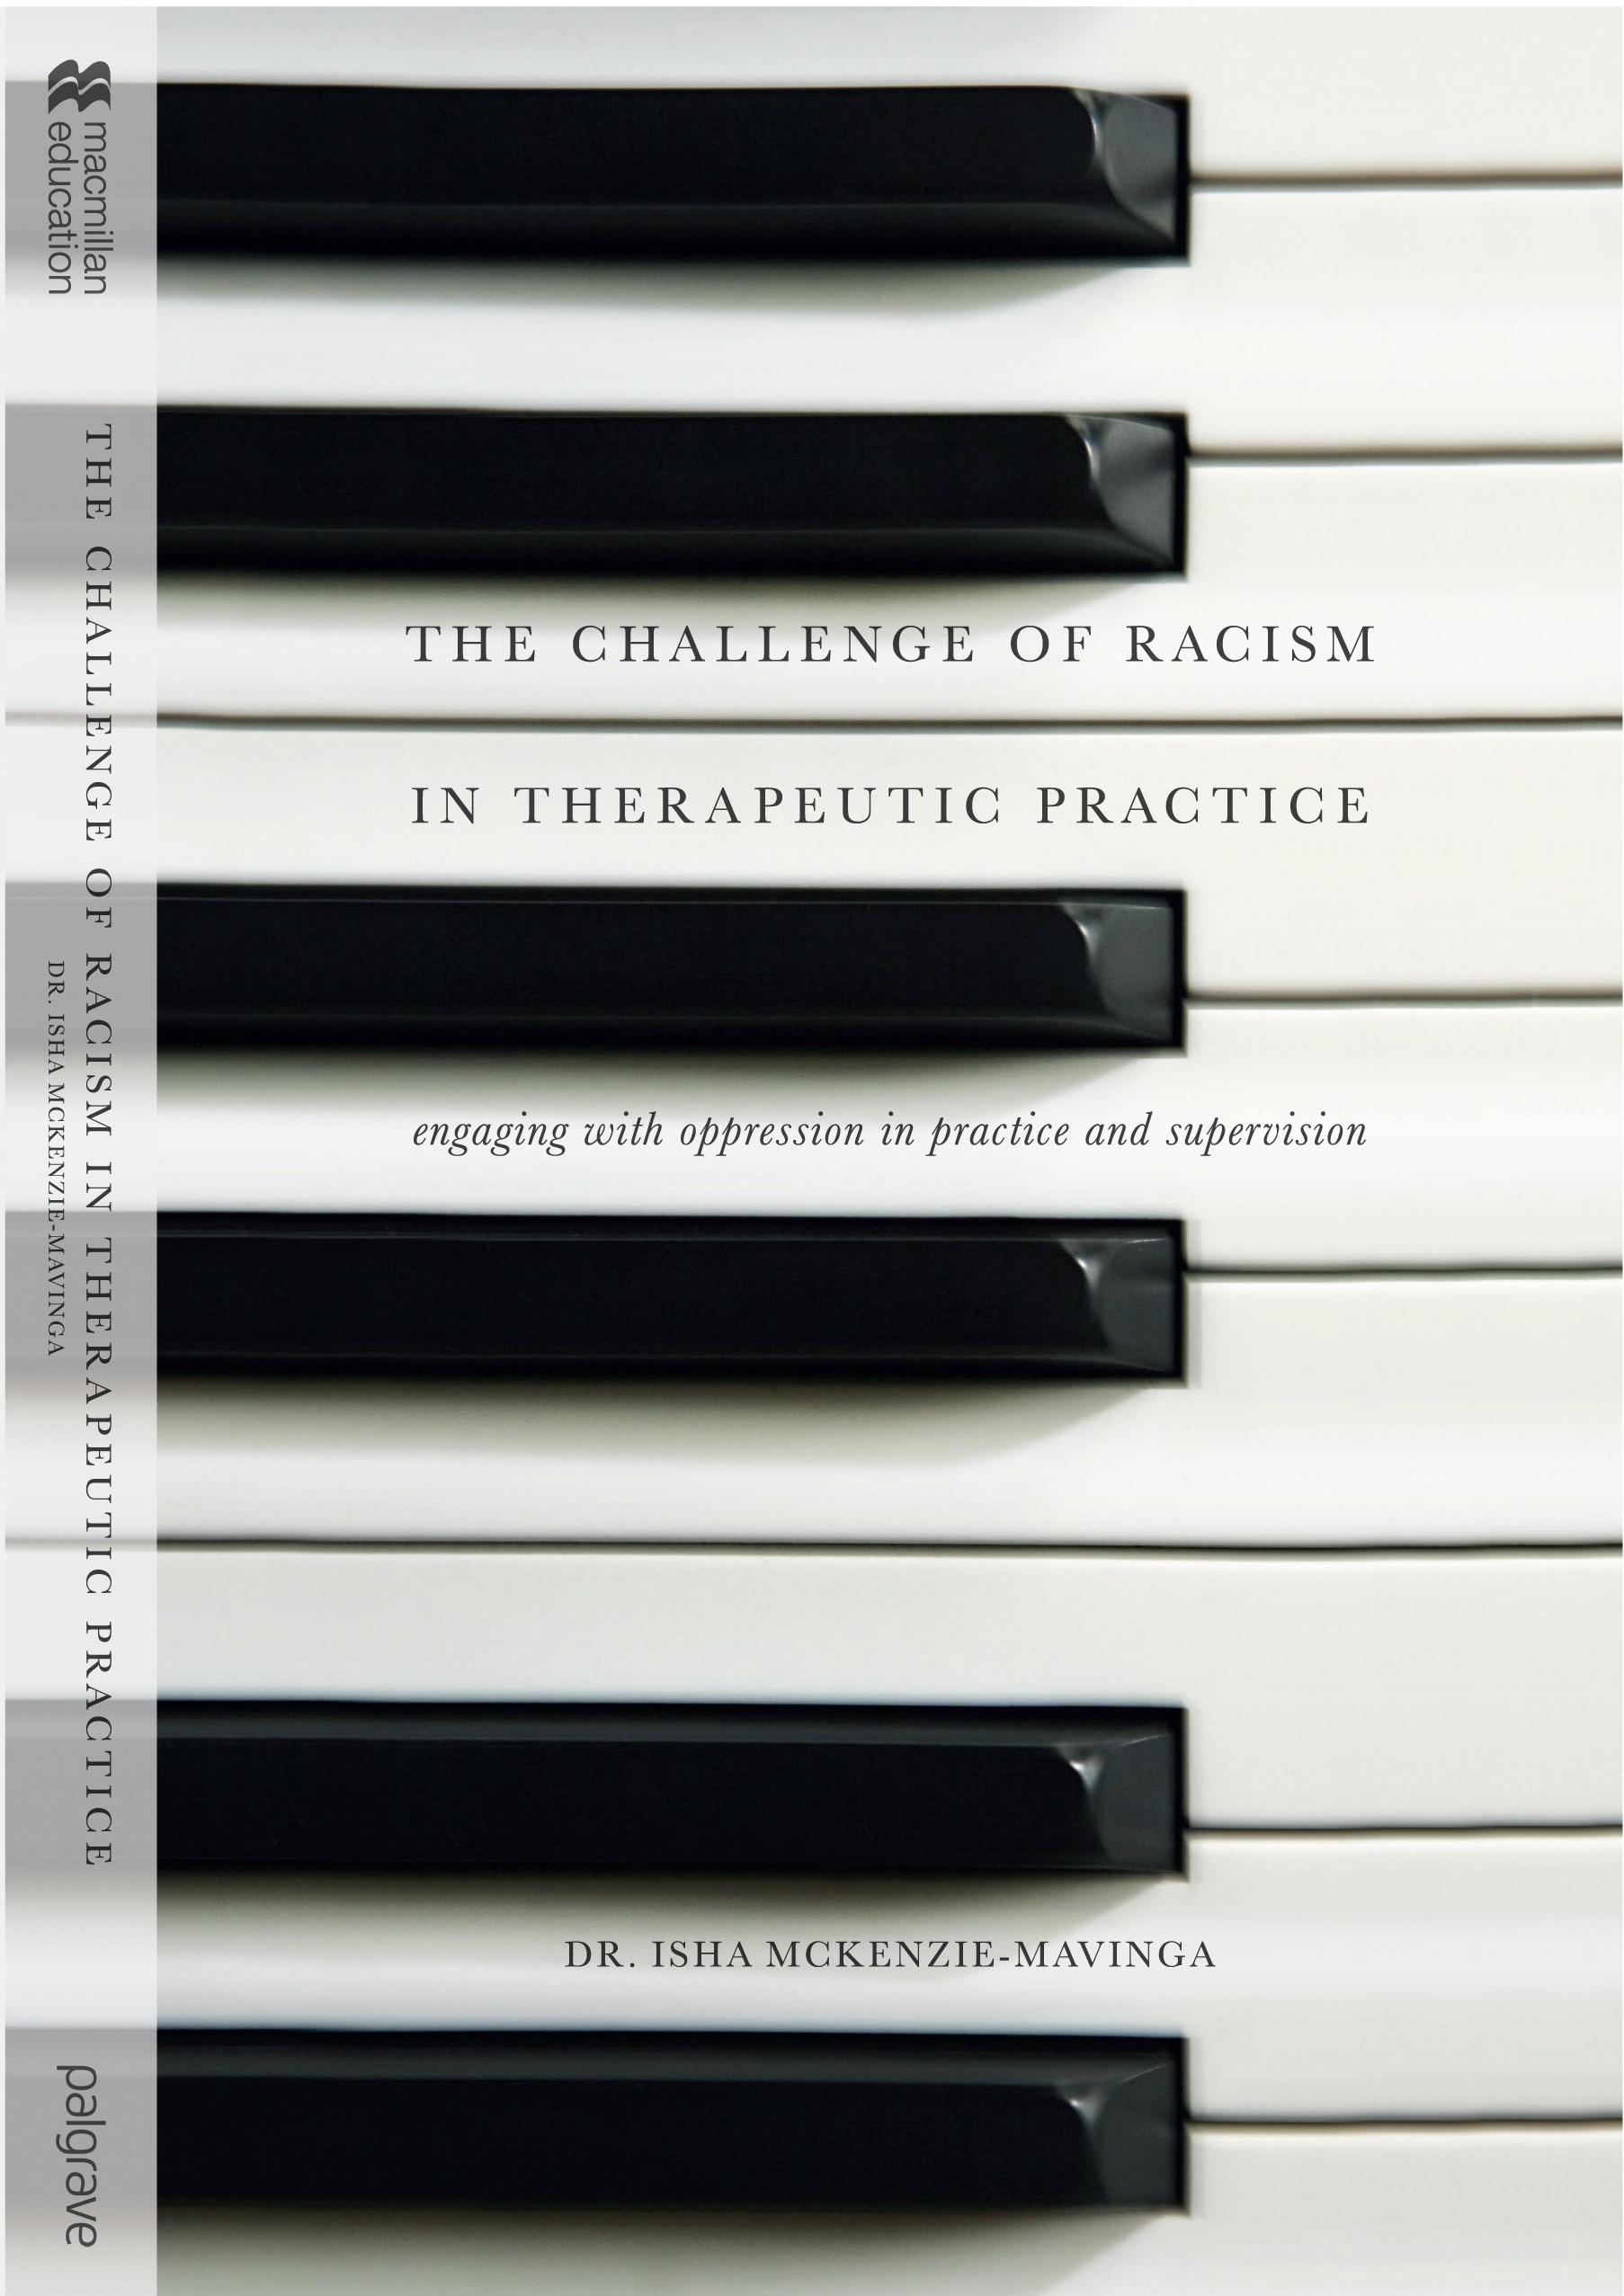 The Challenge of Racism: The Challenge of Racism